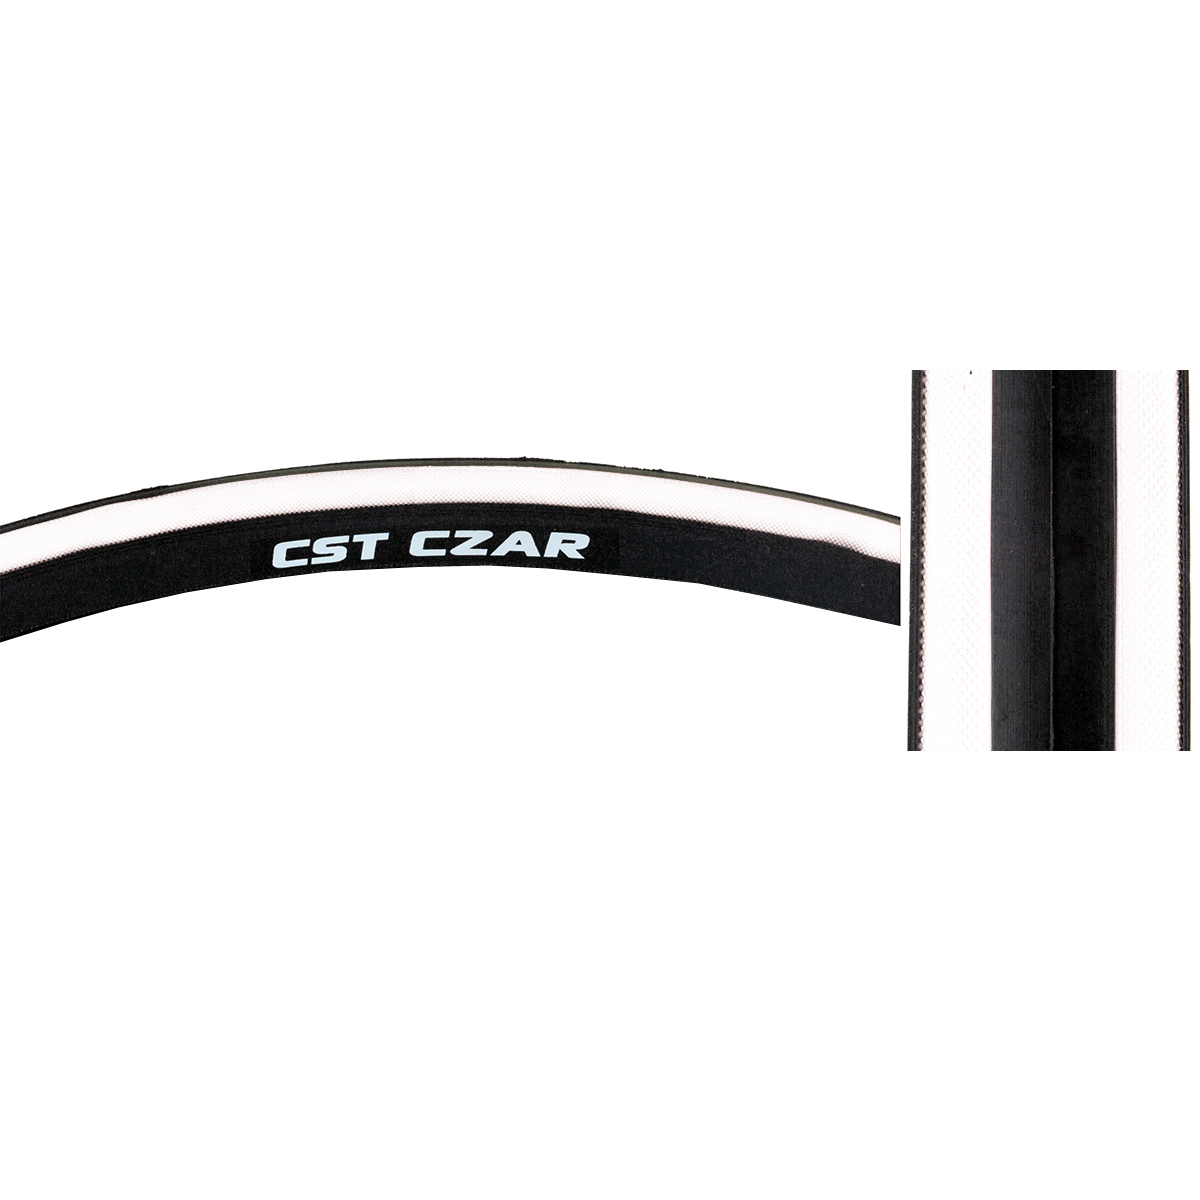 CST Czar Comp Road Tire 700x25c Black Clincher Training Race Fixed Gear Bike